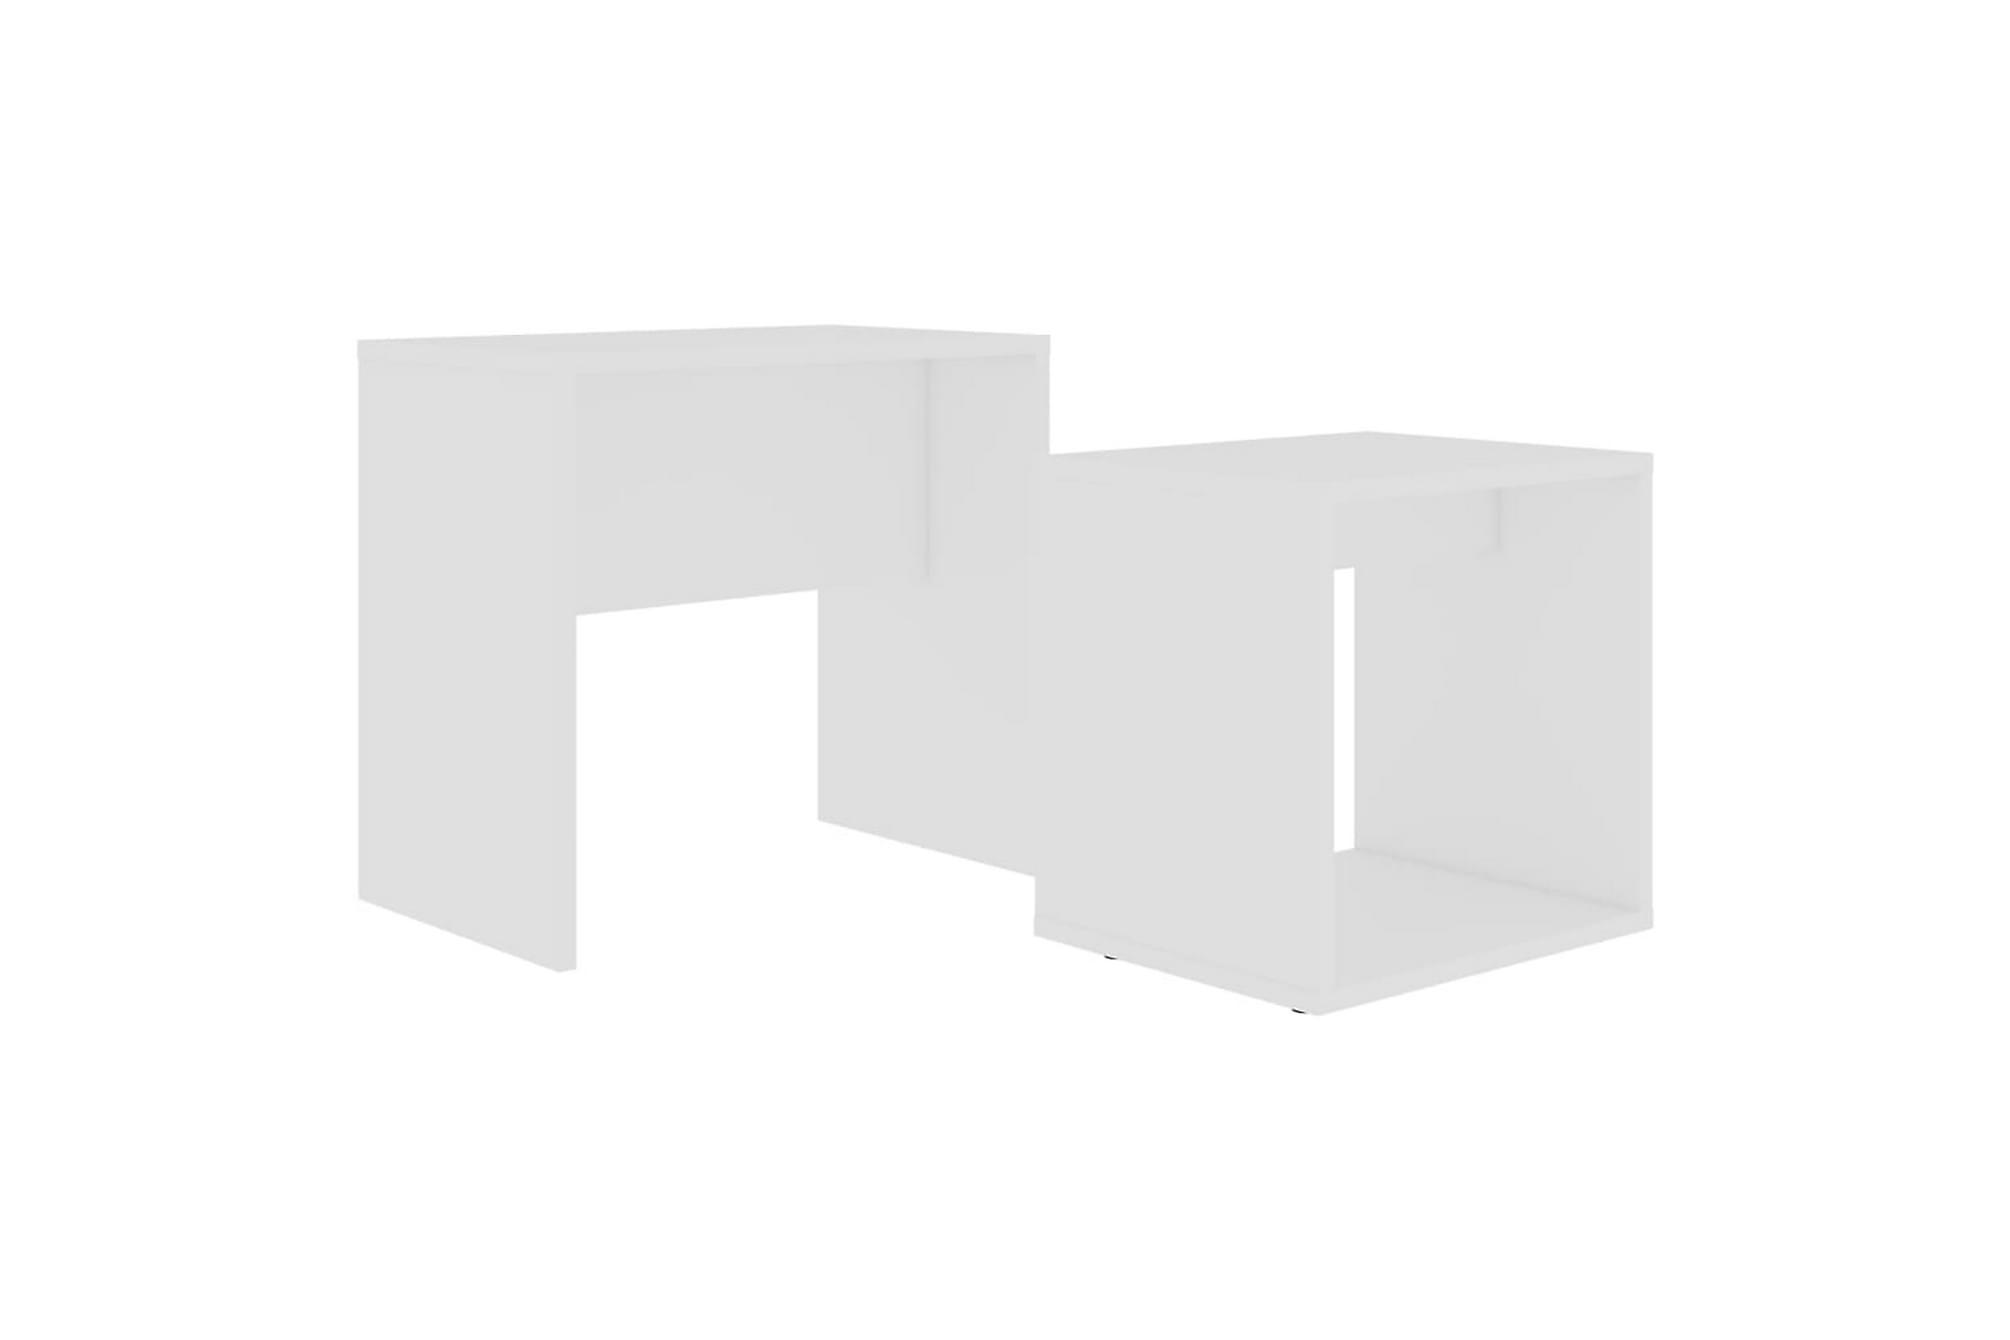 Soffbord set vit högglans 48x30x45 cm spånskiva